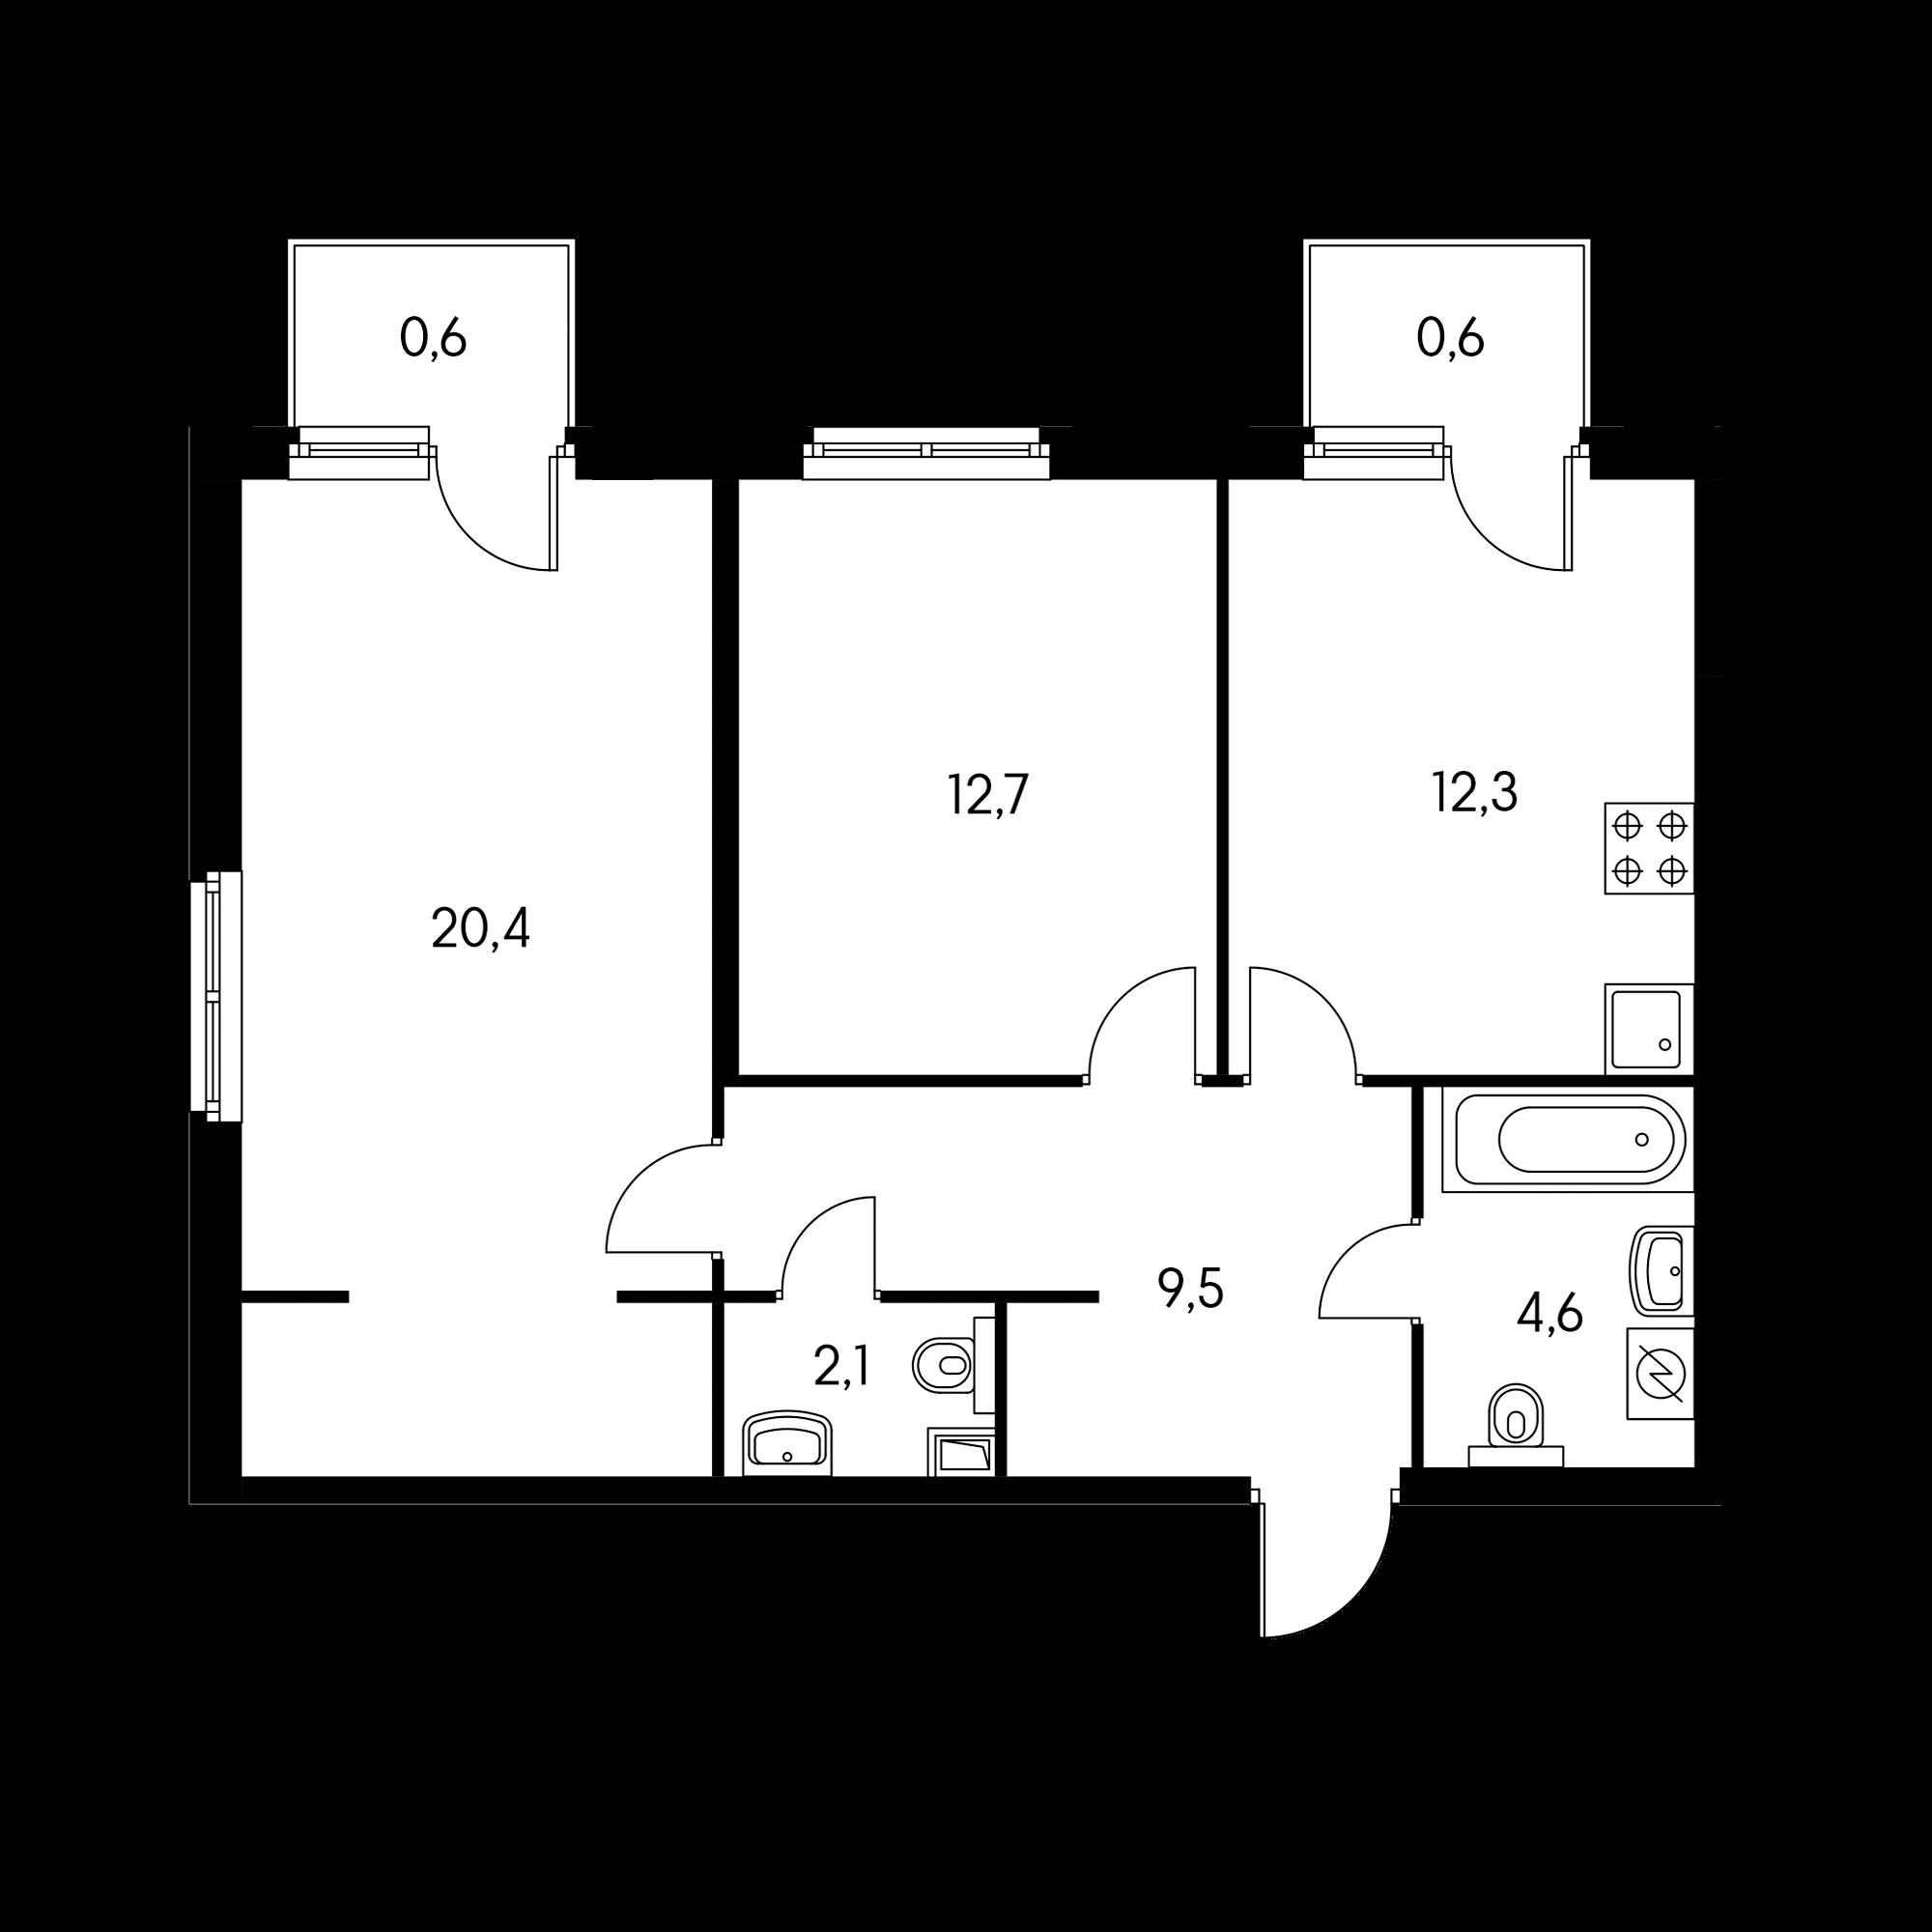 2KM6-B2